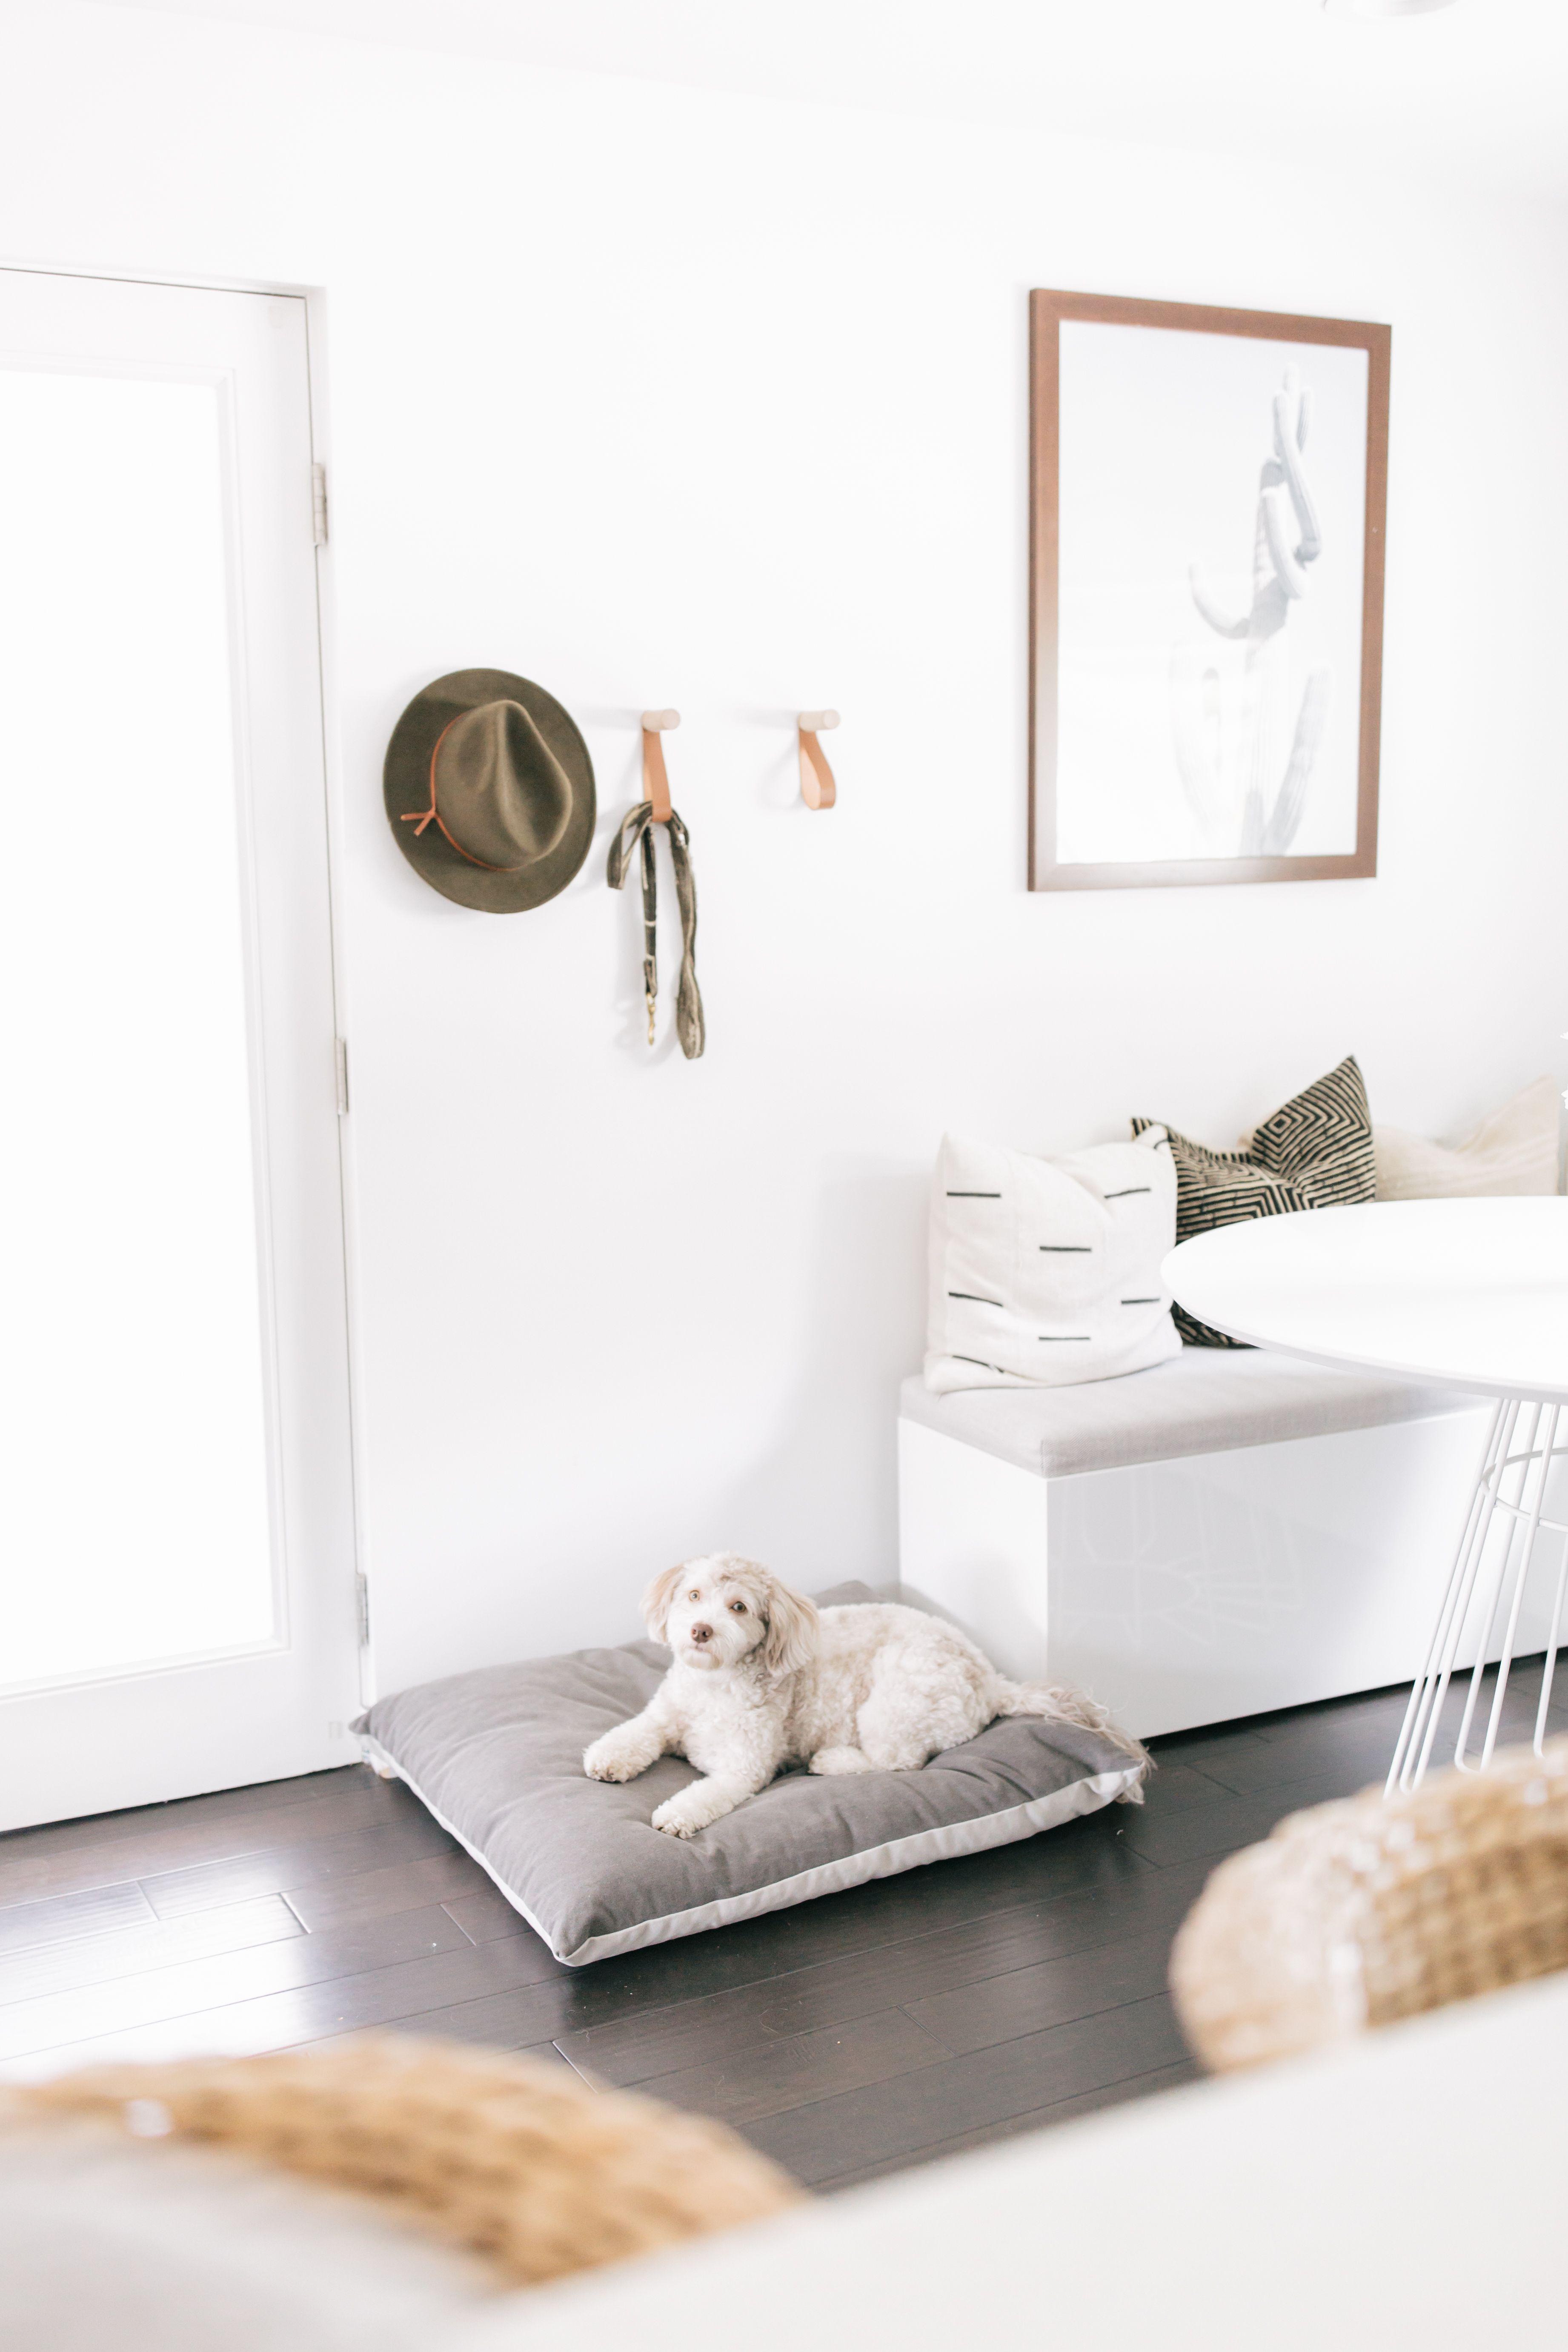 Dog Bed Parachute Dog bed, Dog bed modern, Dog home decor